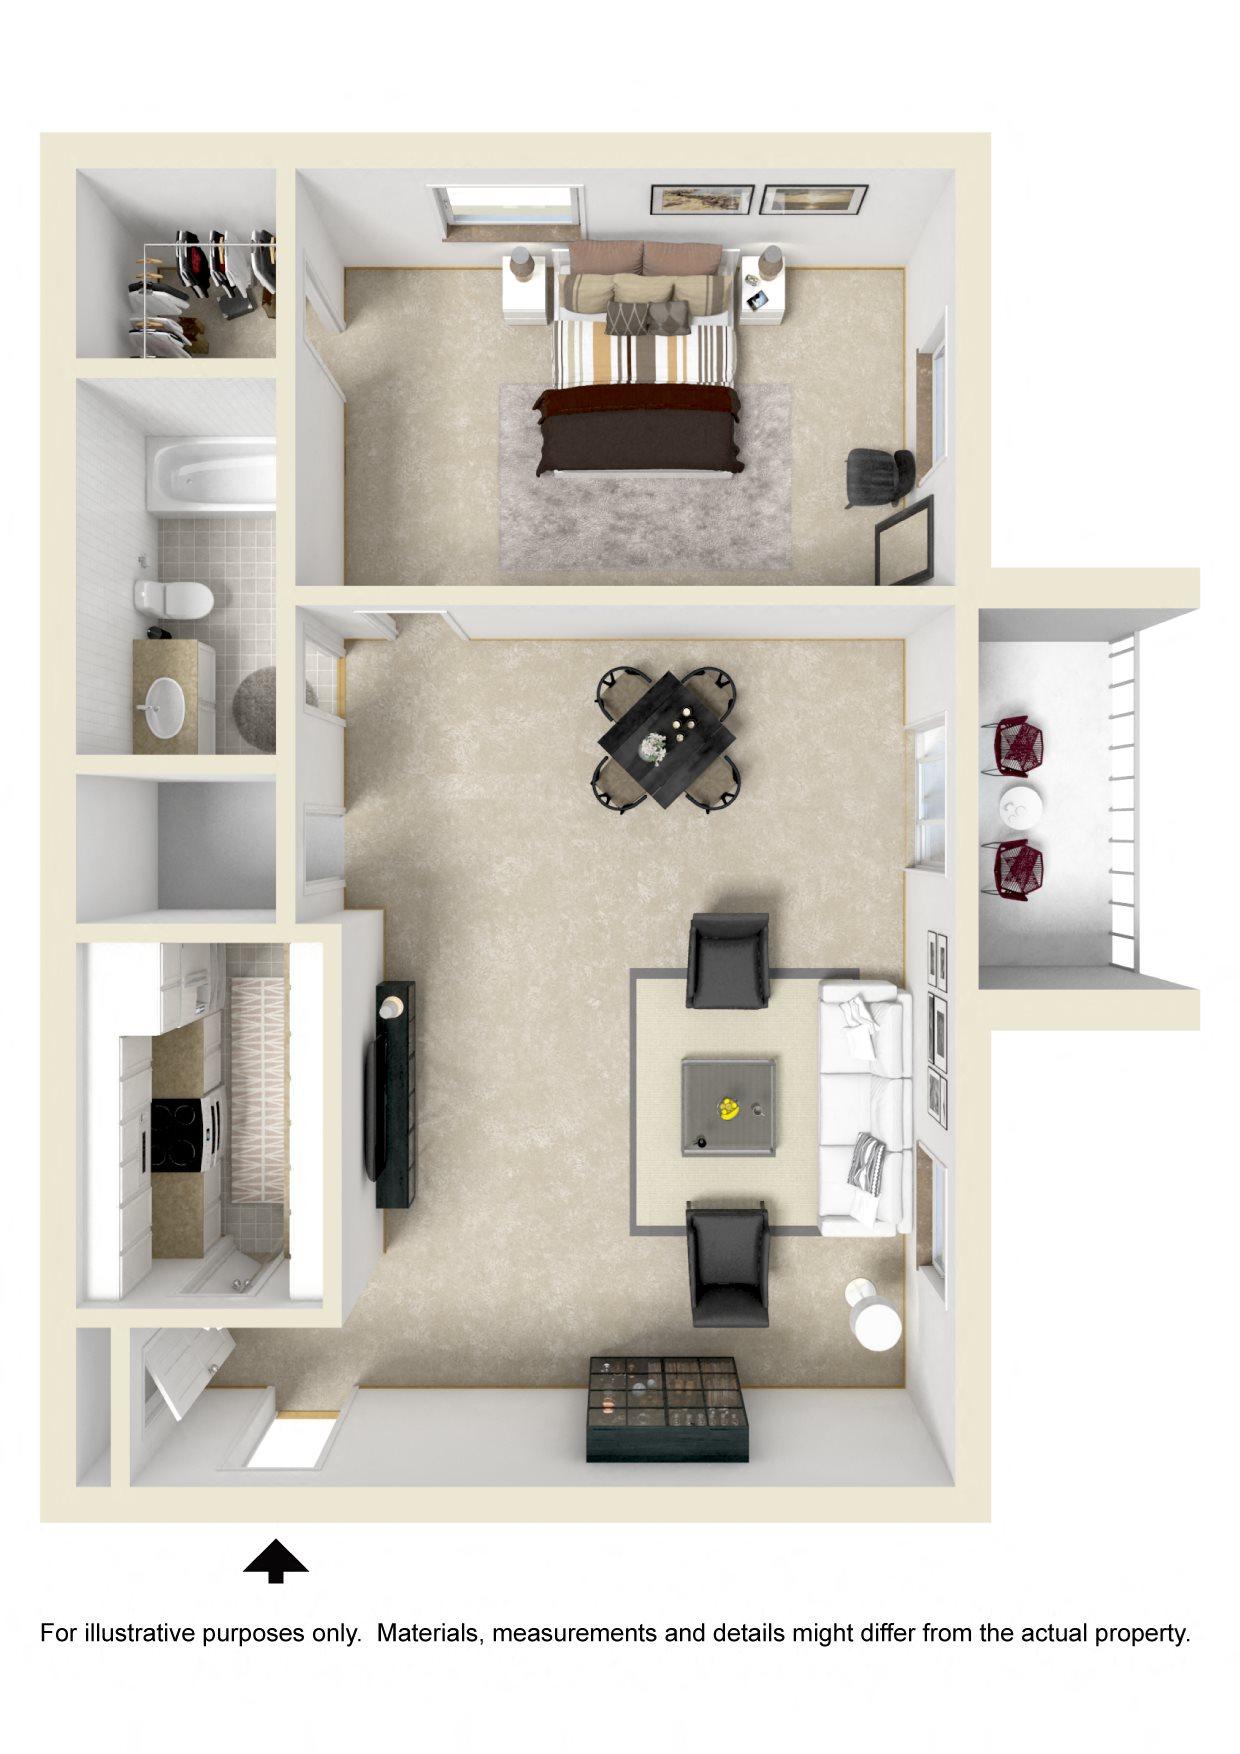 1 BR / 1 BATH 620 SF Floor Plan 1